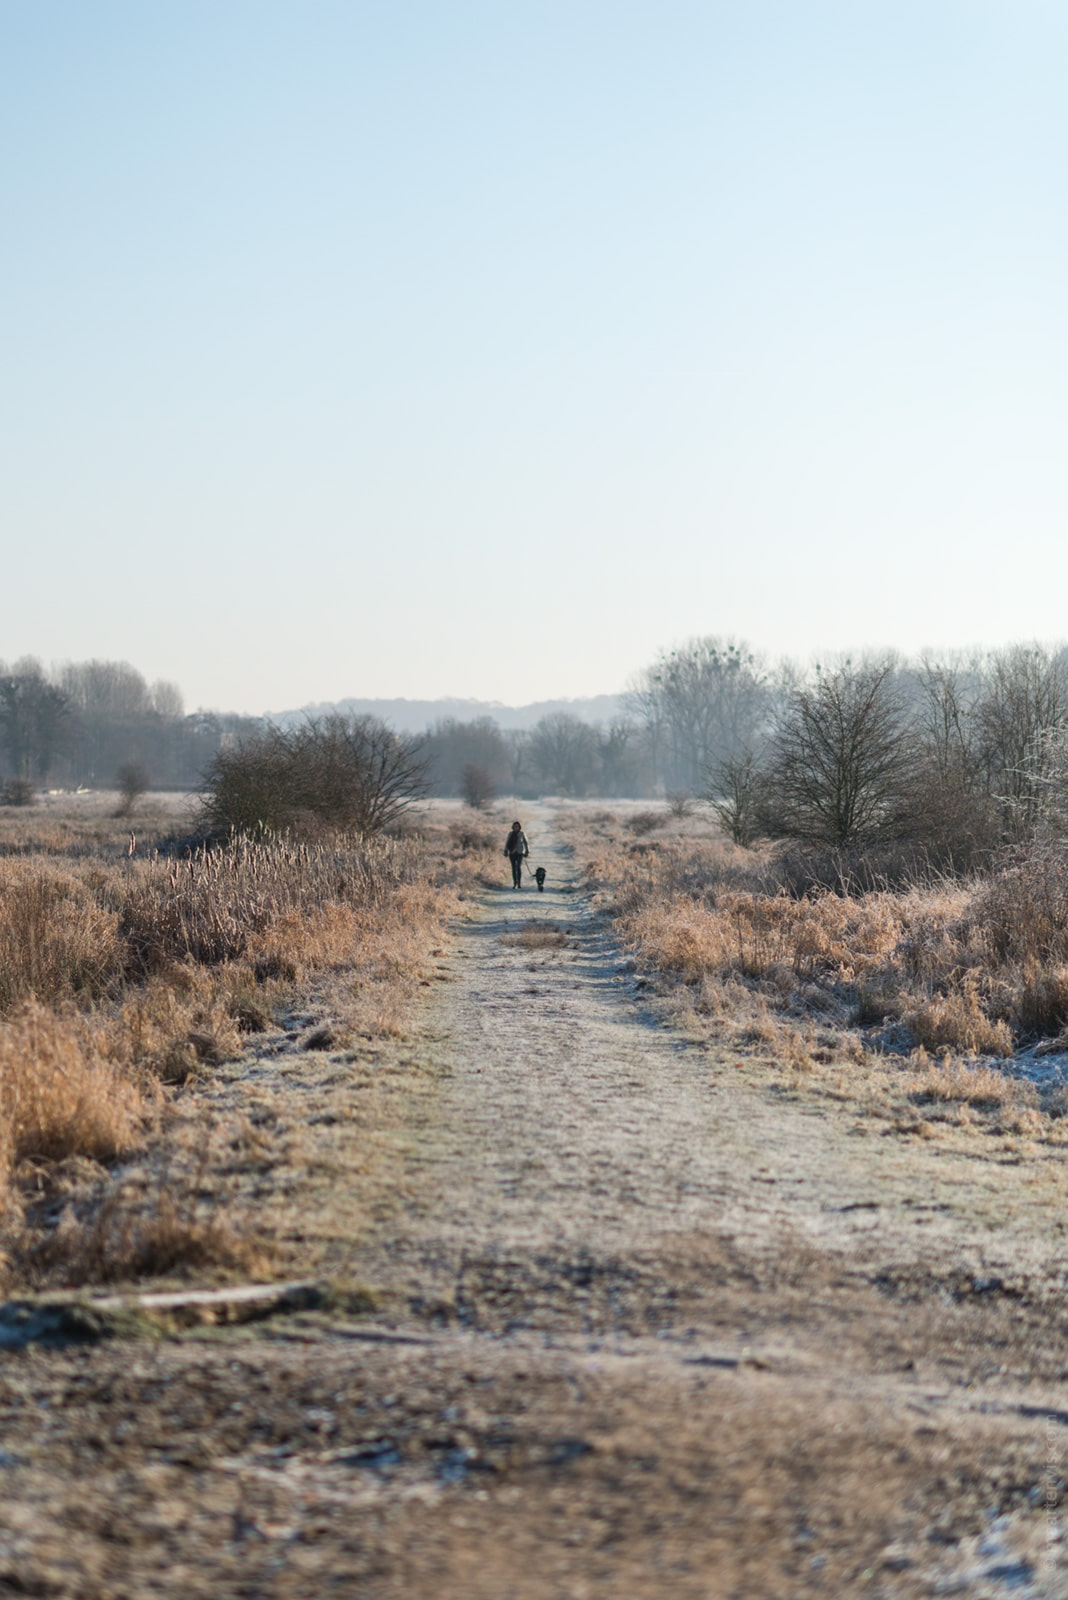 20170101 7429 - Winter in Limburg